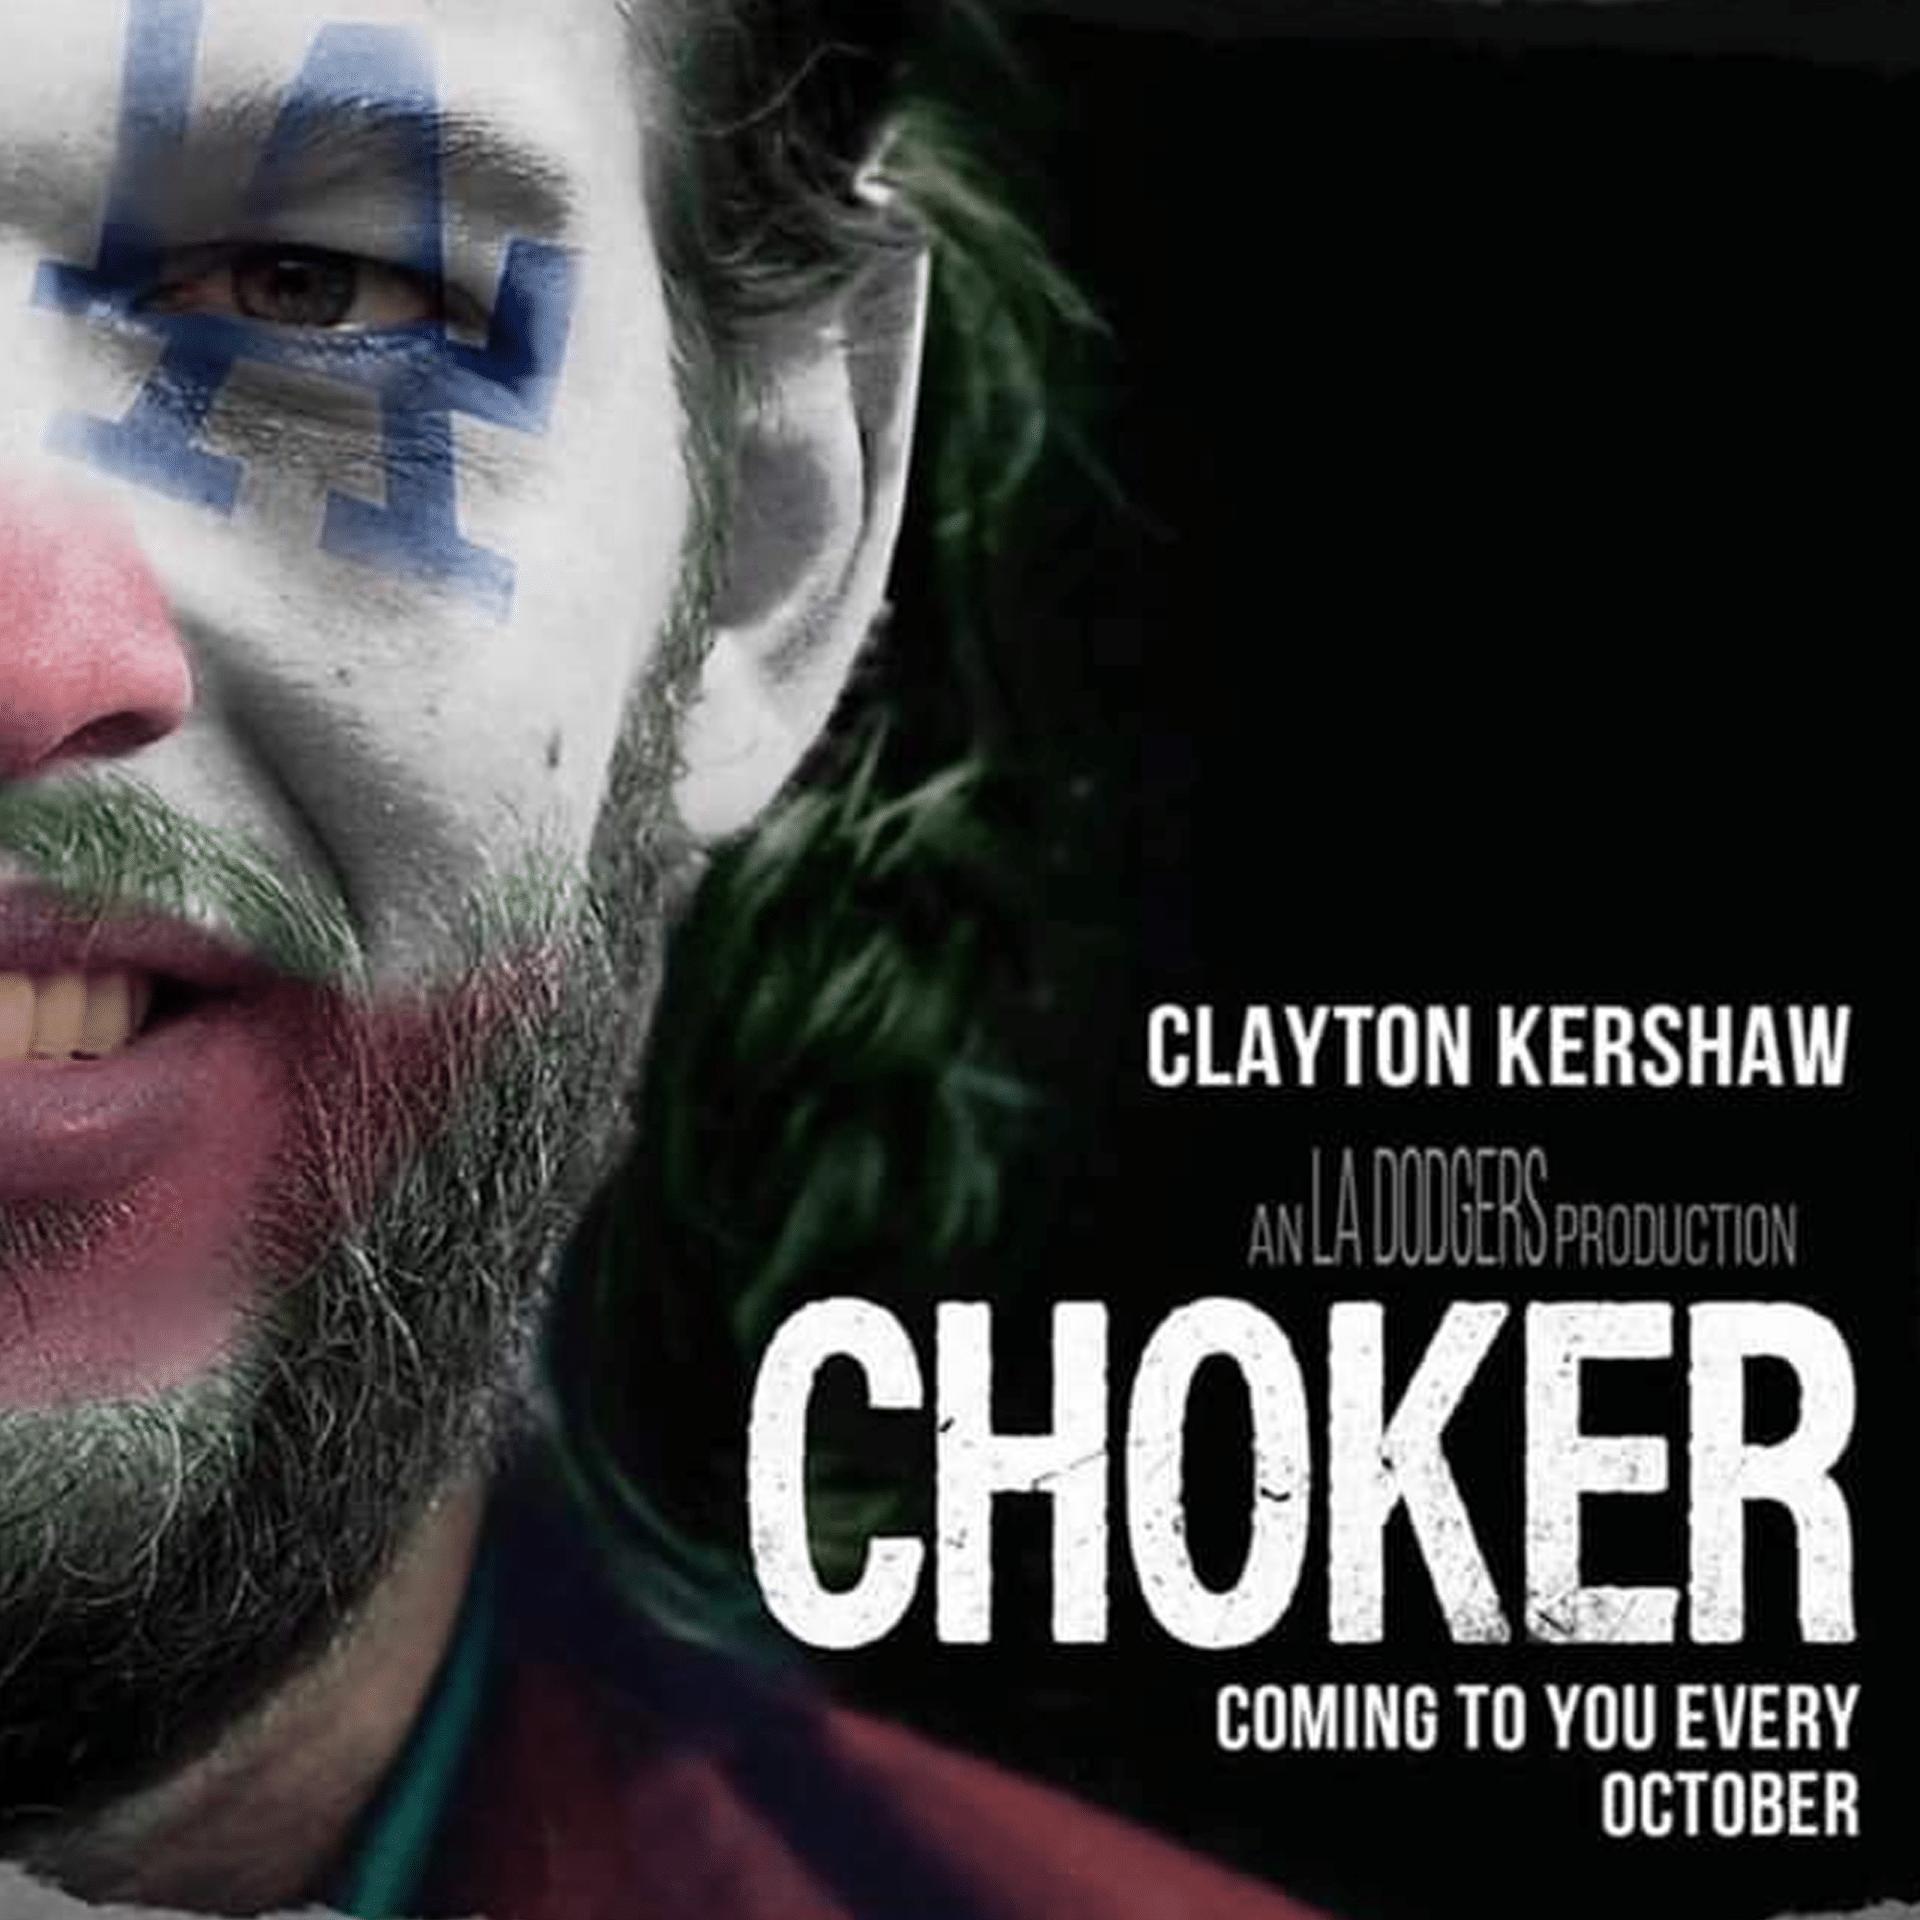 Sports Talk With Corey Clark - Clayton Kershaw has stamped his way to Chokestown